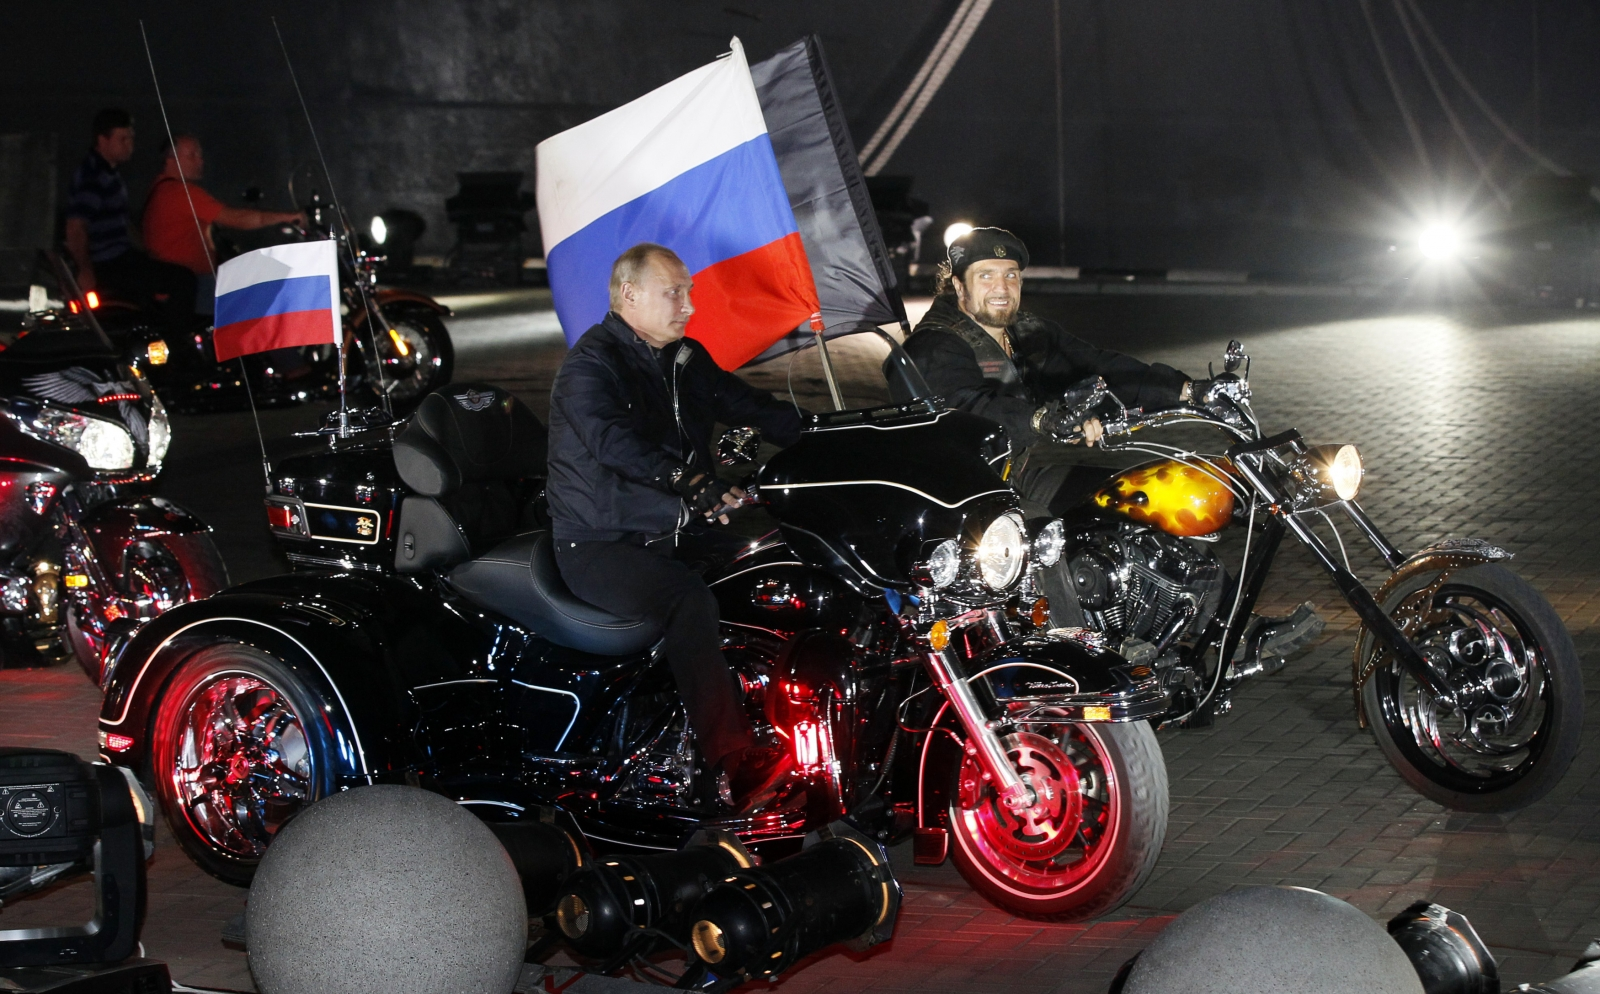 Putin Russia bikers